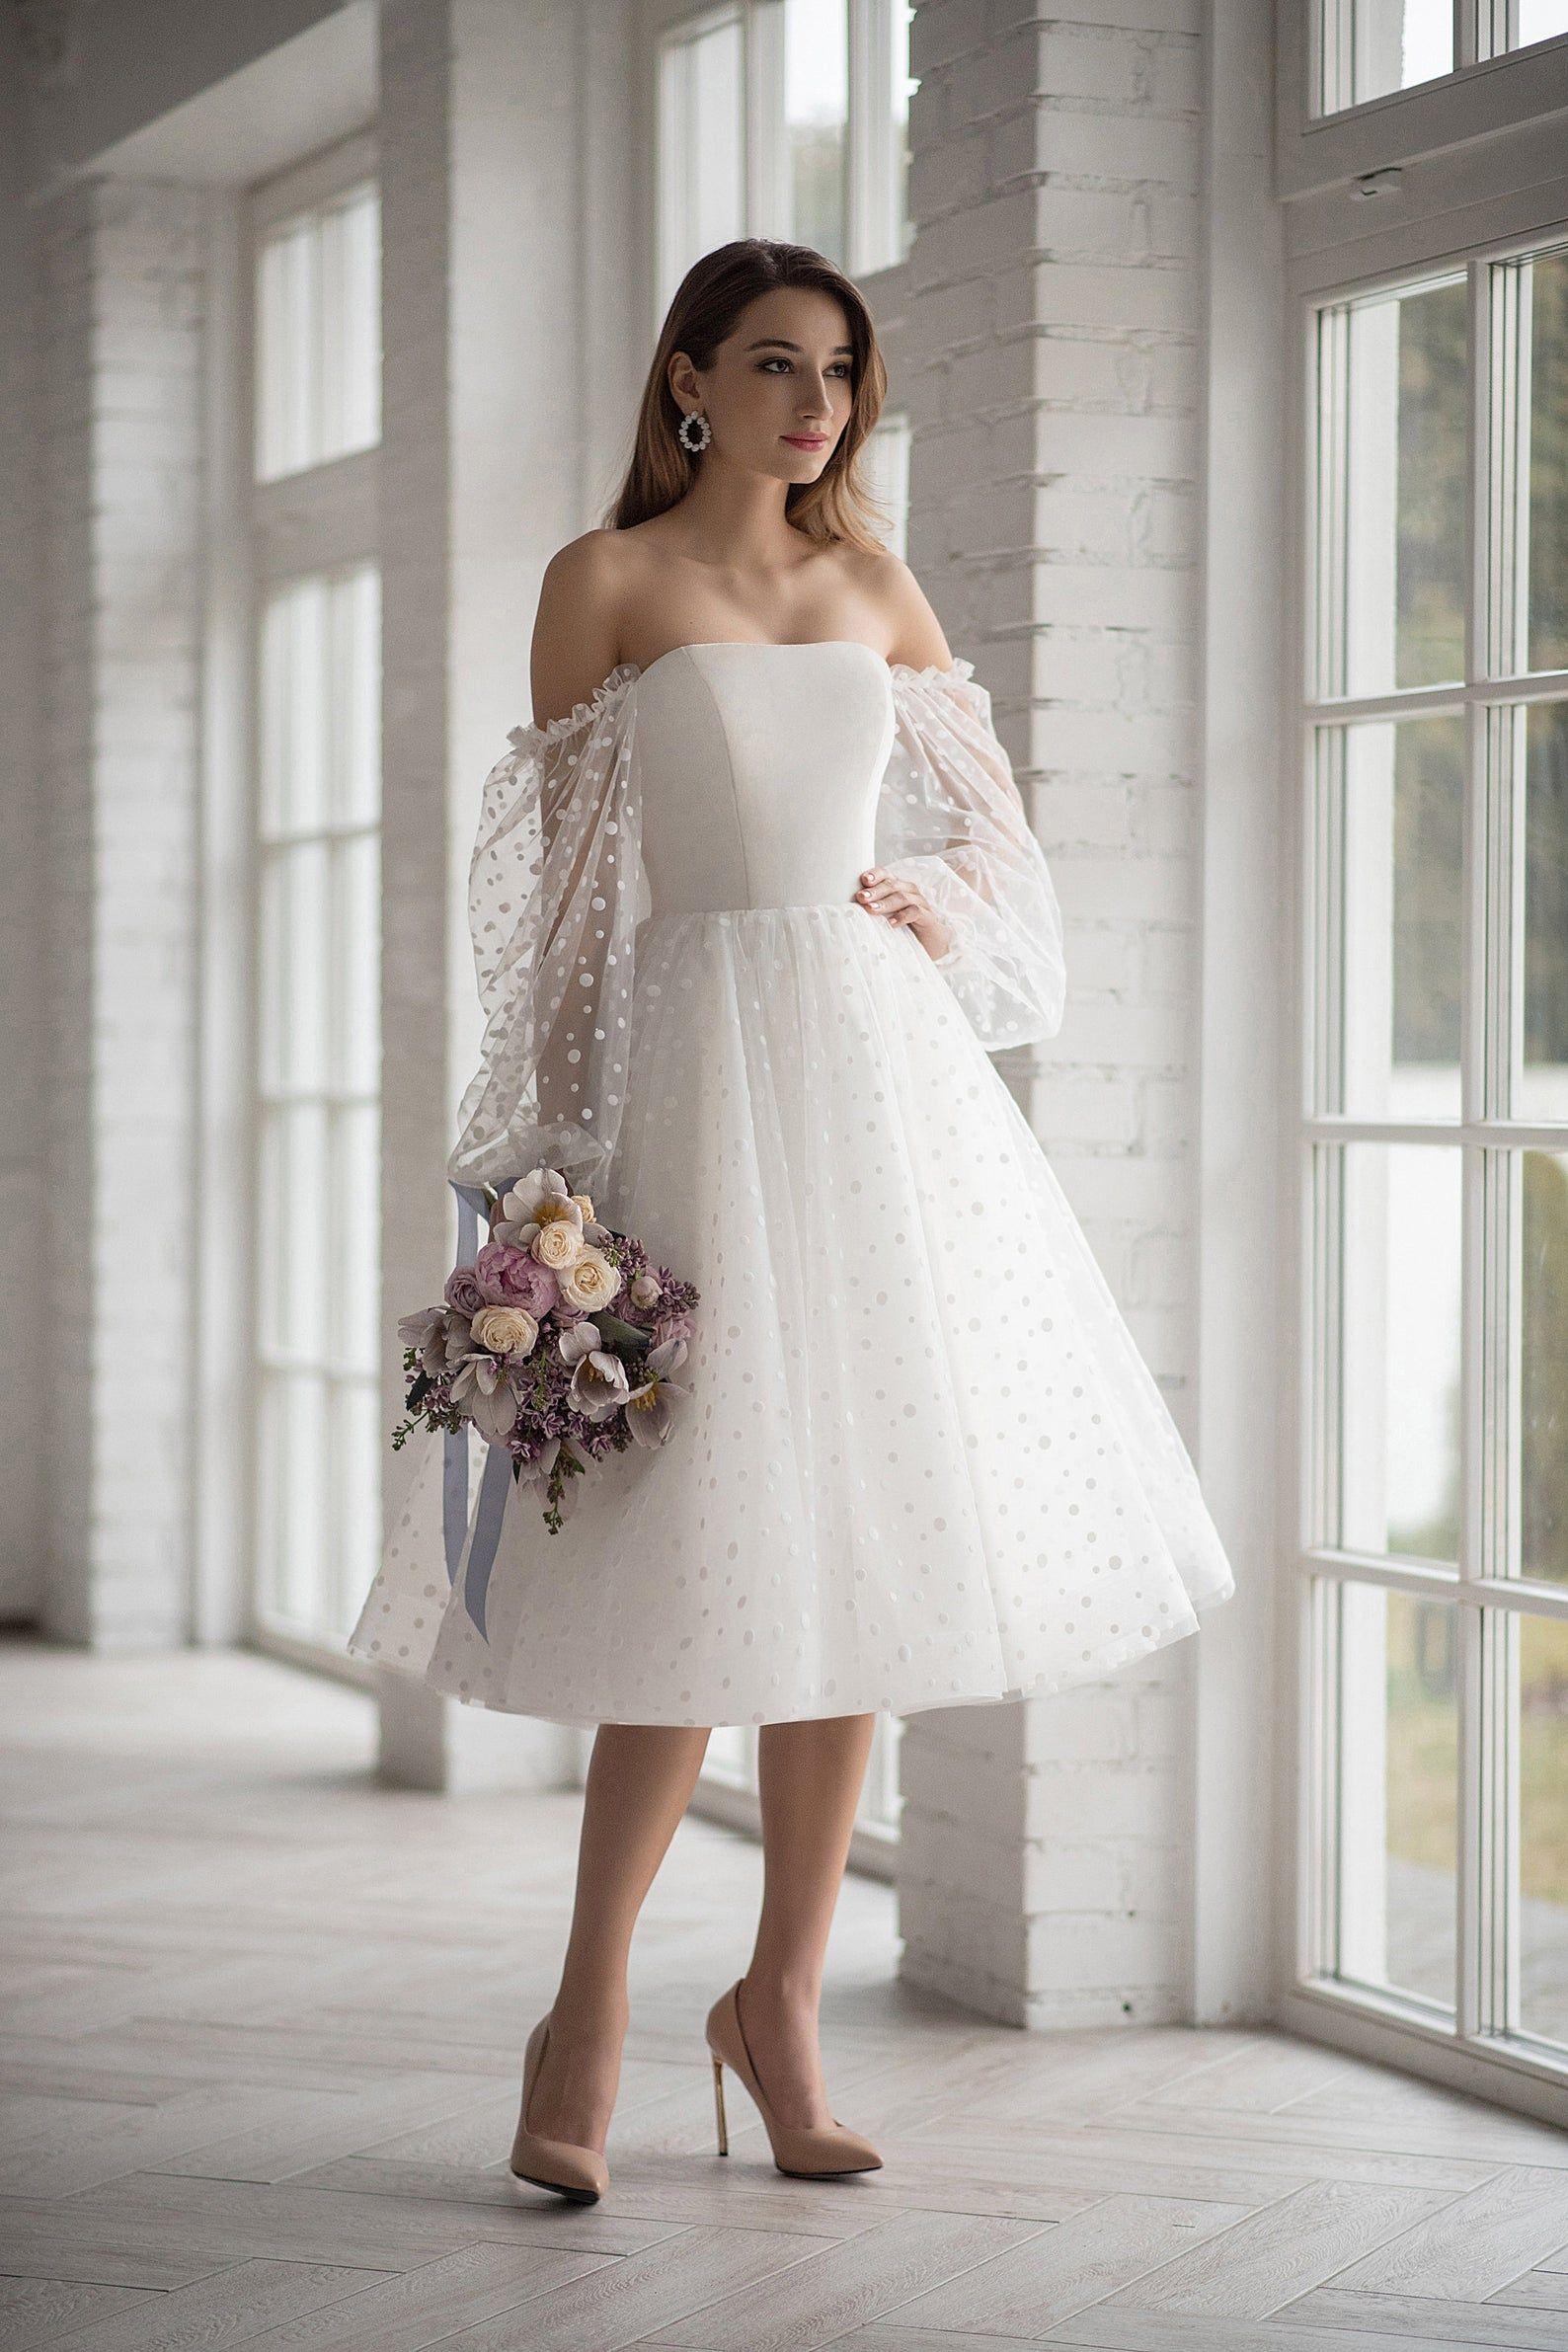 Short Wedding Dresses V Neck Lace Tea Length Ivory Simple Vintage Bridal Gown Jkw258 Tea Length Wedding Dress Vintage Bridal Gowns Vintage Short Wedding Dress [ 1139 x 1012 Pixel ]